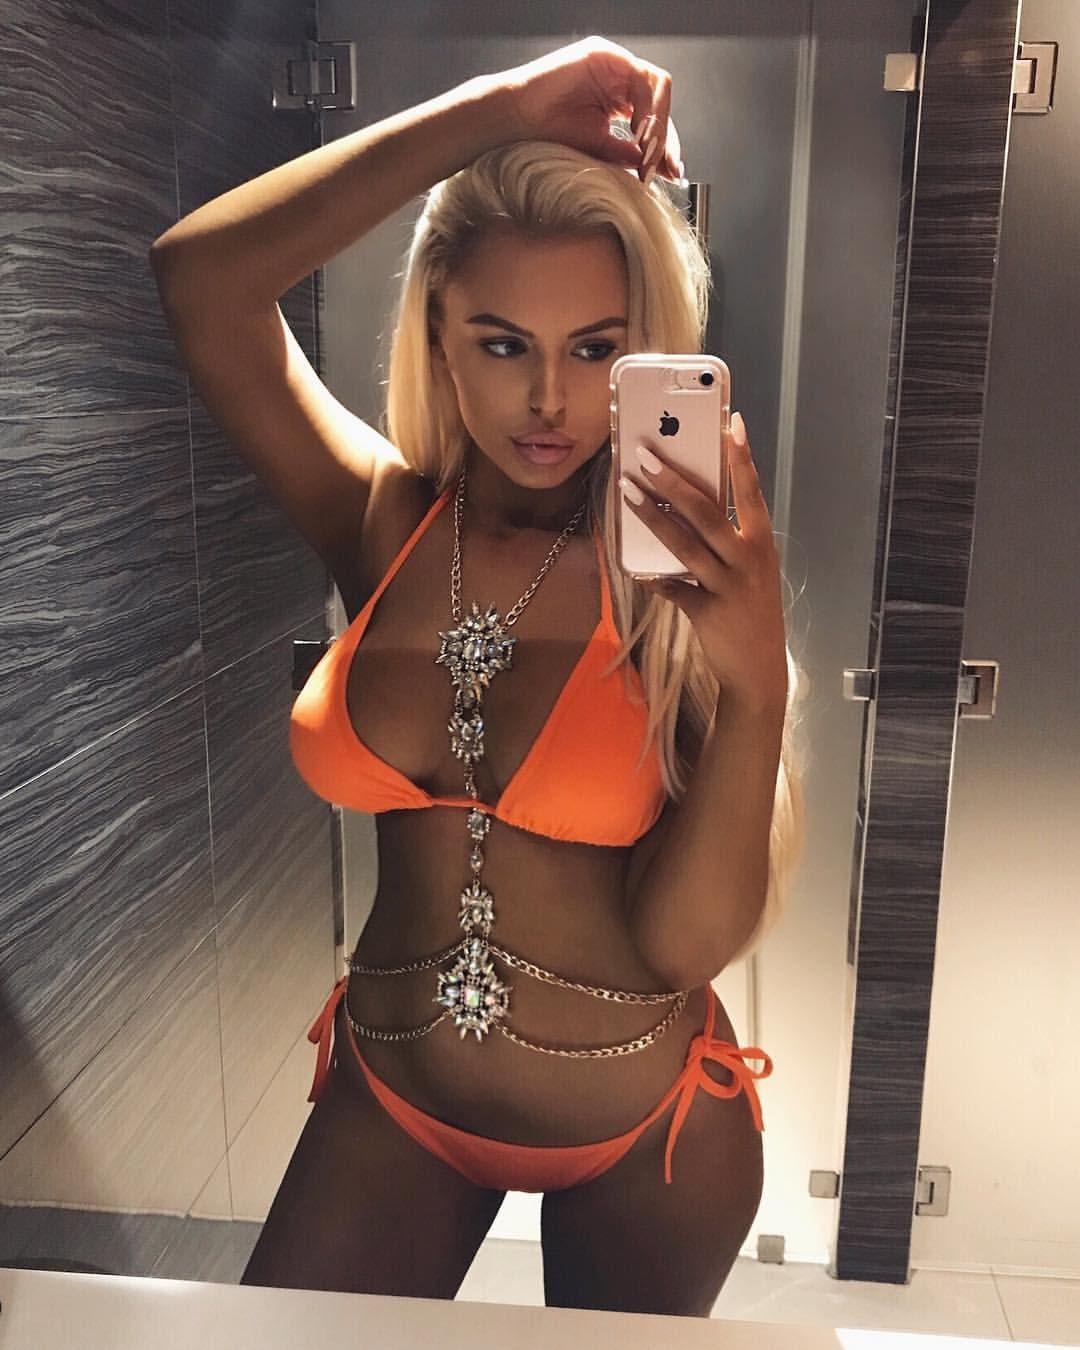 seems good blonde twerking suck dick orgy not very well? will